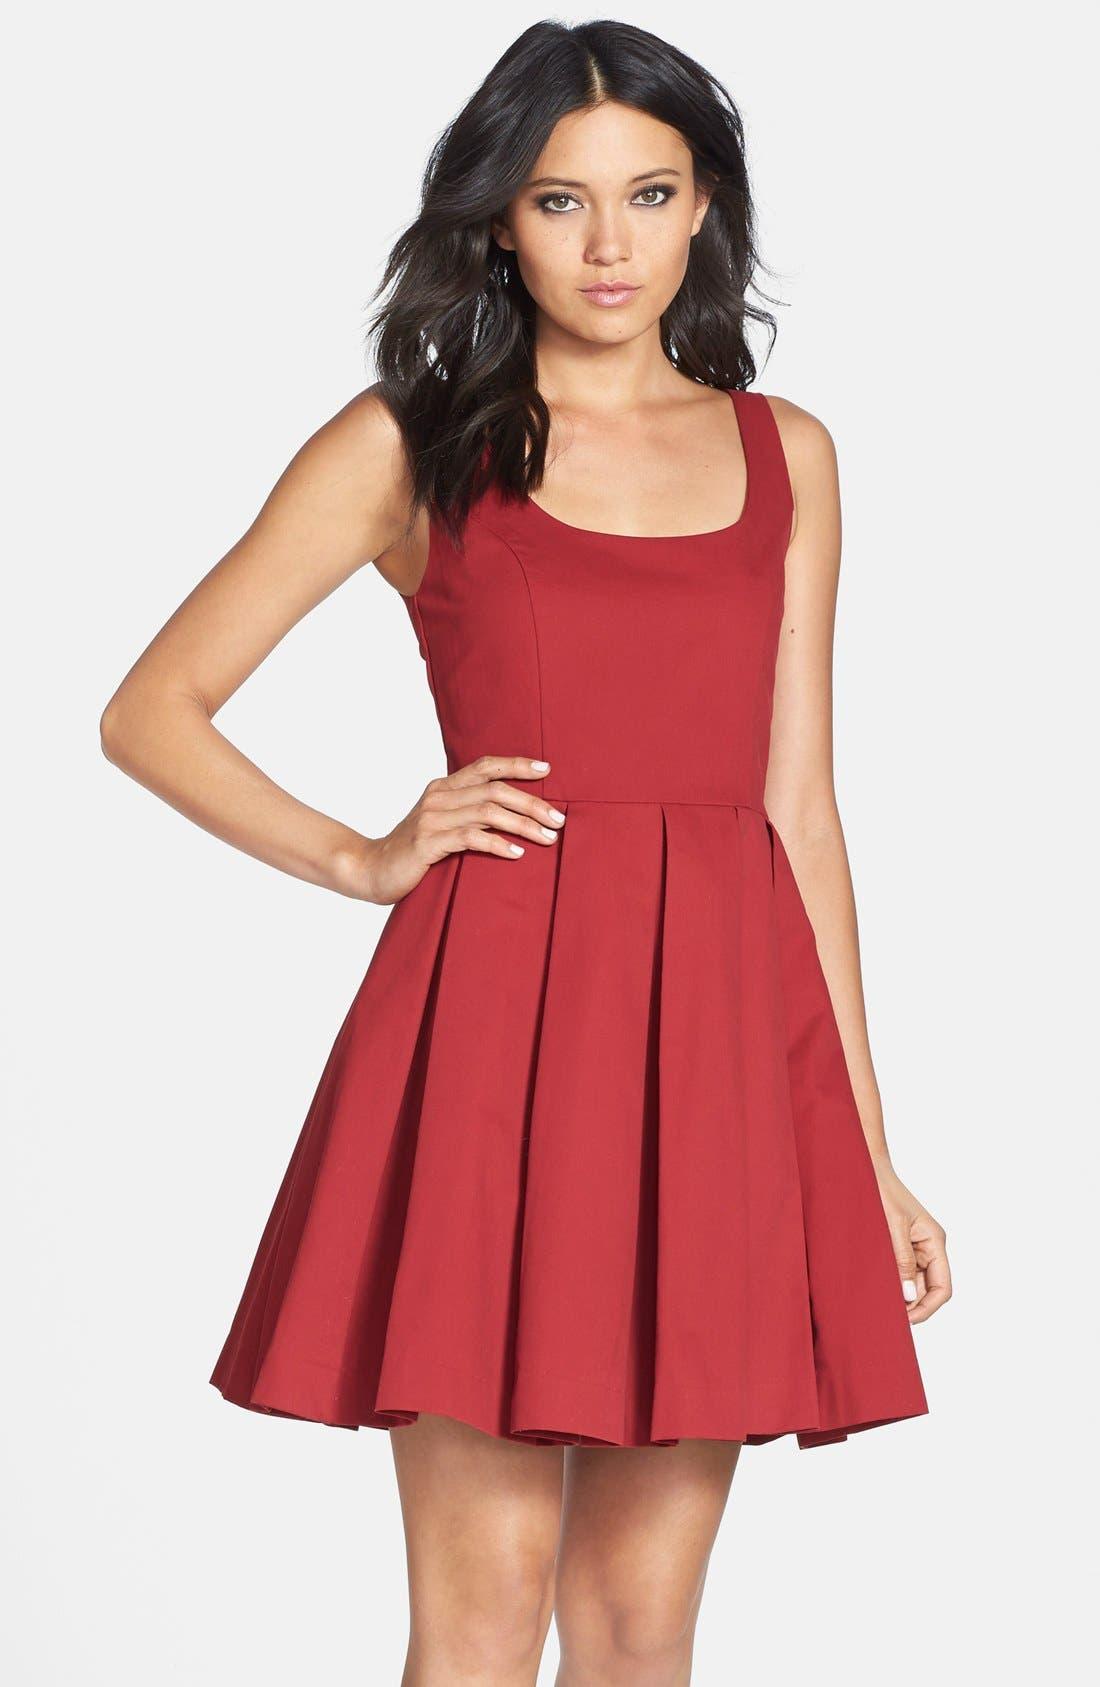 Alternate Image 1 Selected - BB Dakota 'Dane' Pleat Fit & Flare Dress